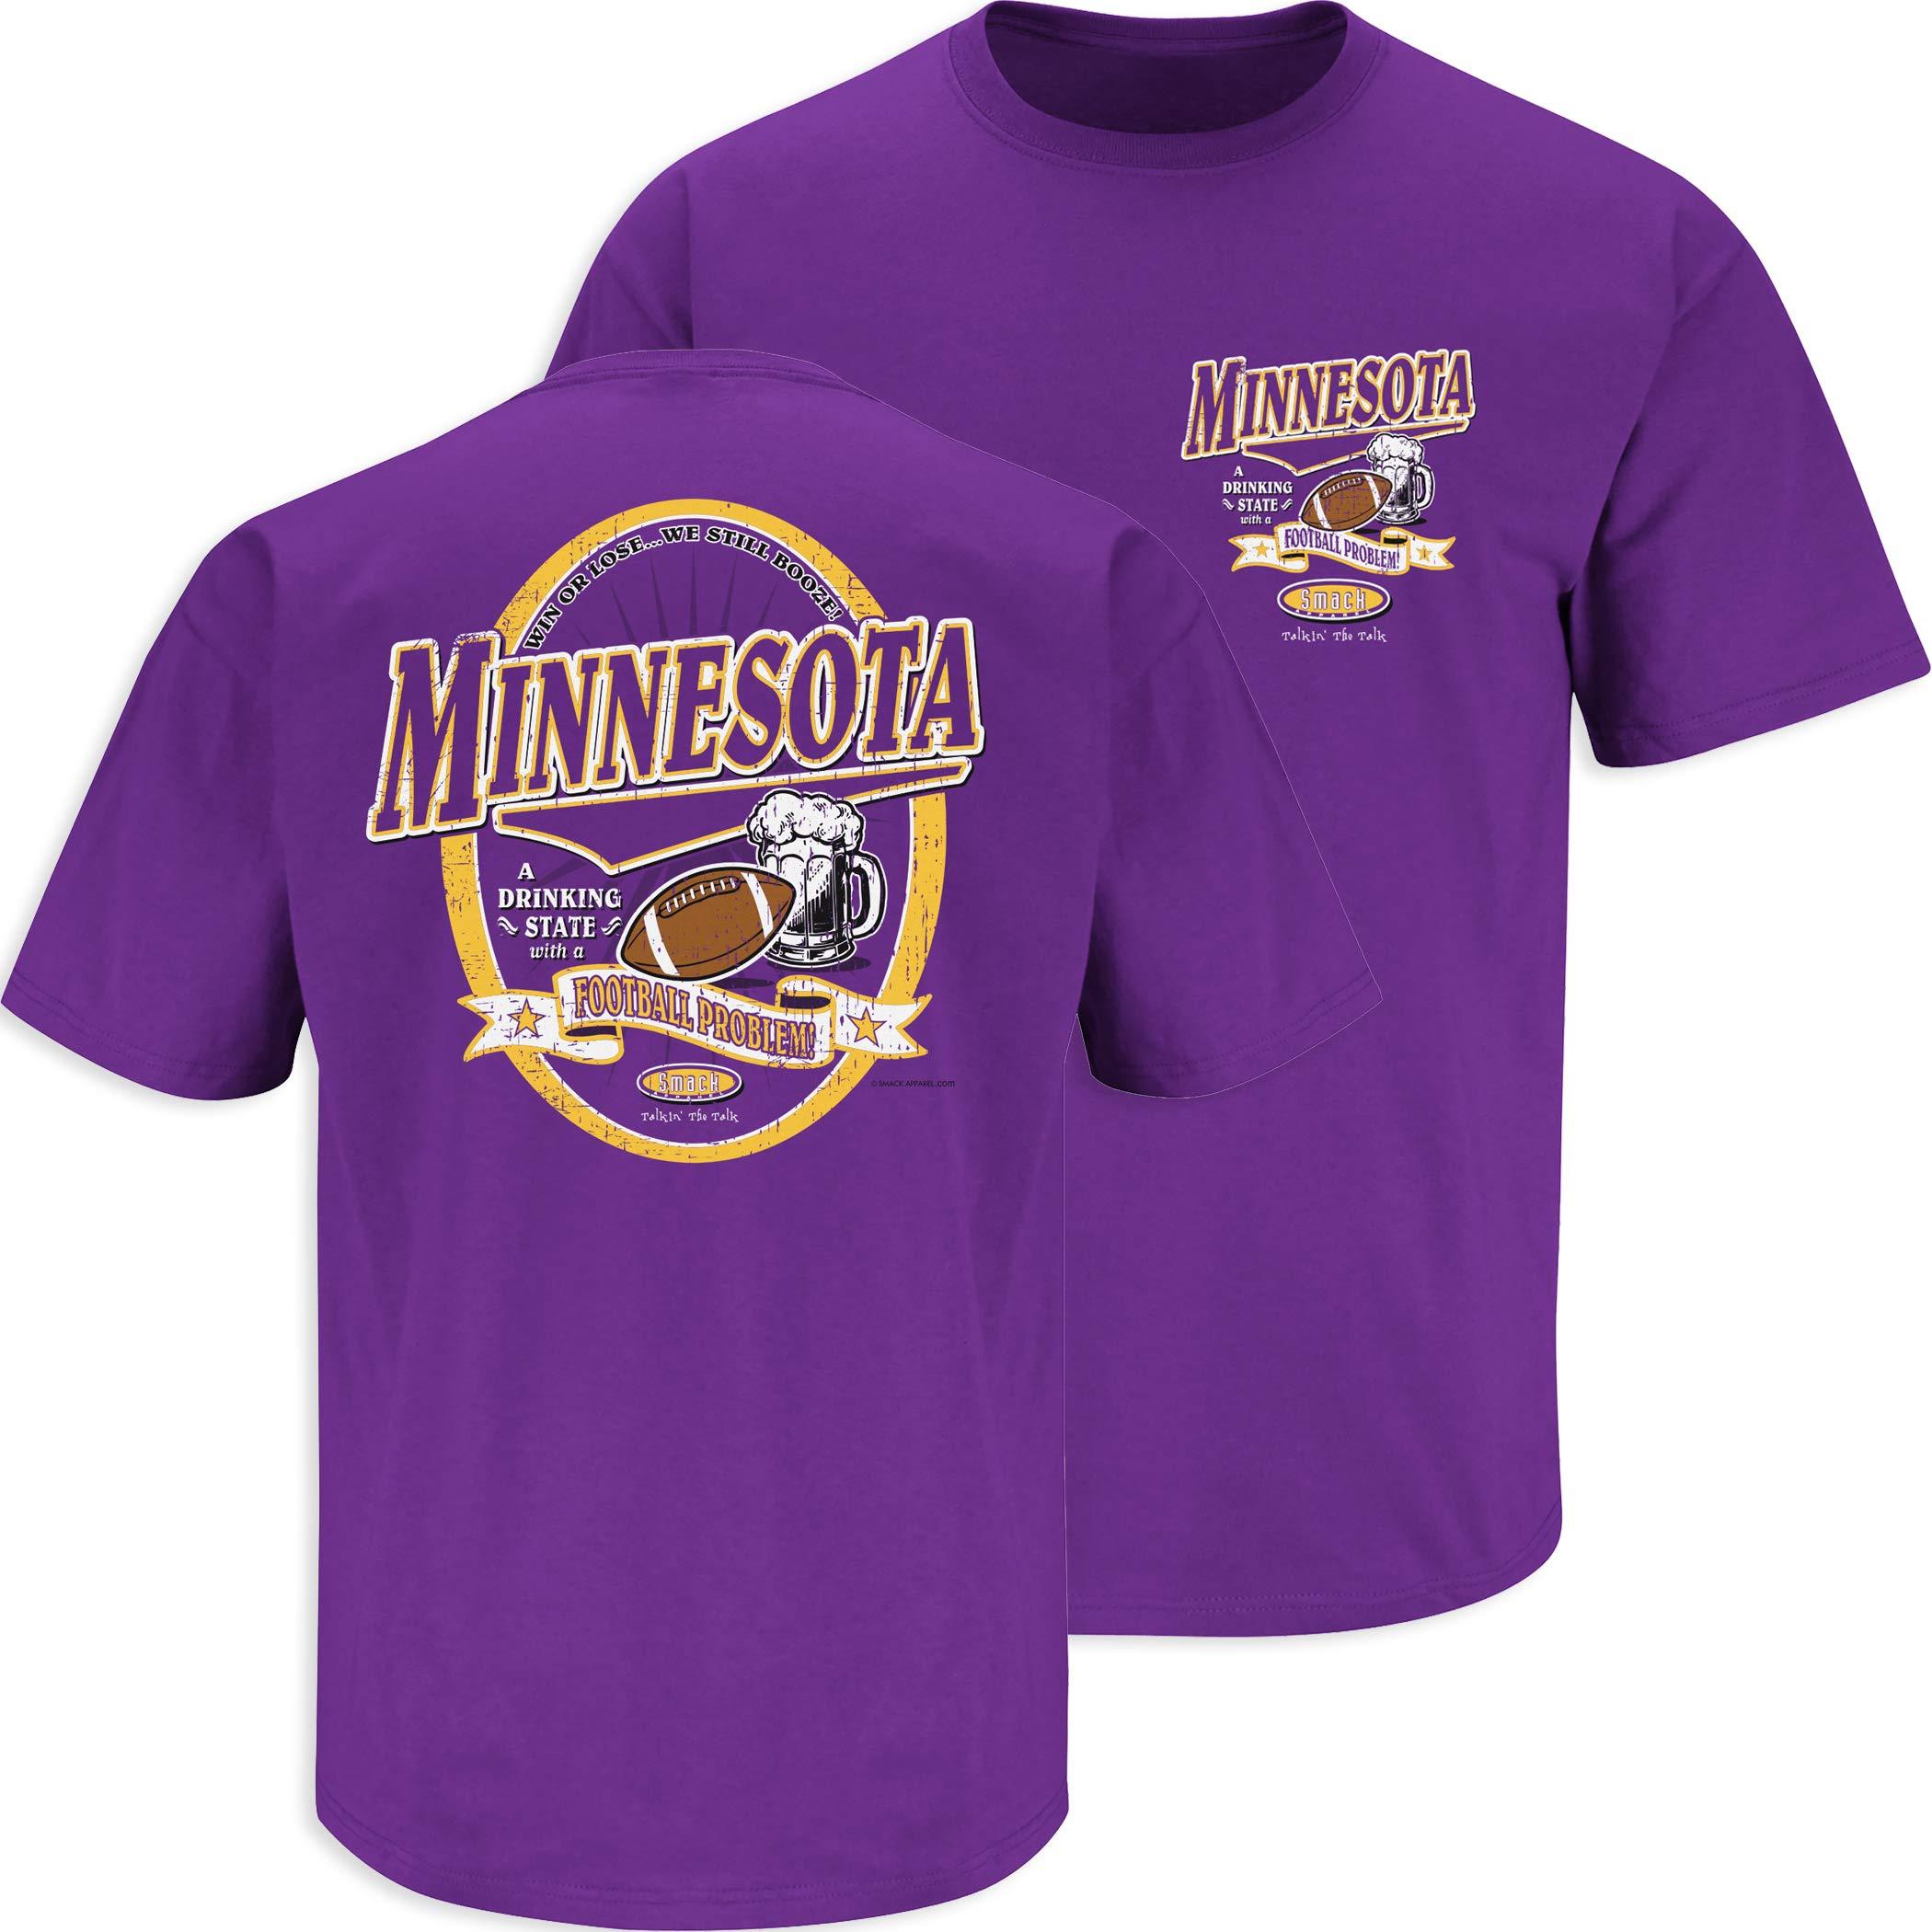 Ventiladores Minnesota Vikings Minnesota. A Drinking State With A Football Problem, camiseta de color morado (S-5X), XXXL, Púrpura: Amazon.es: Deportes y aire libre